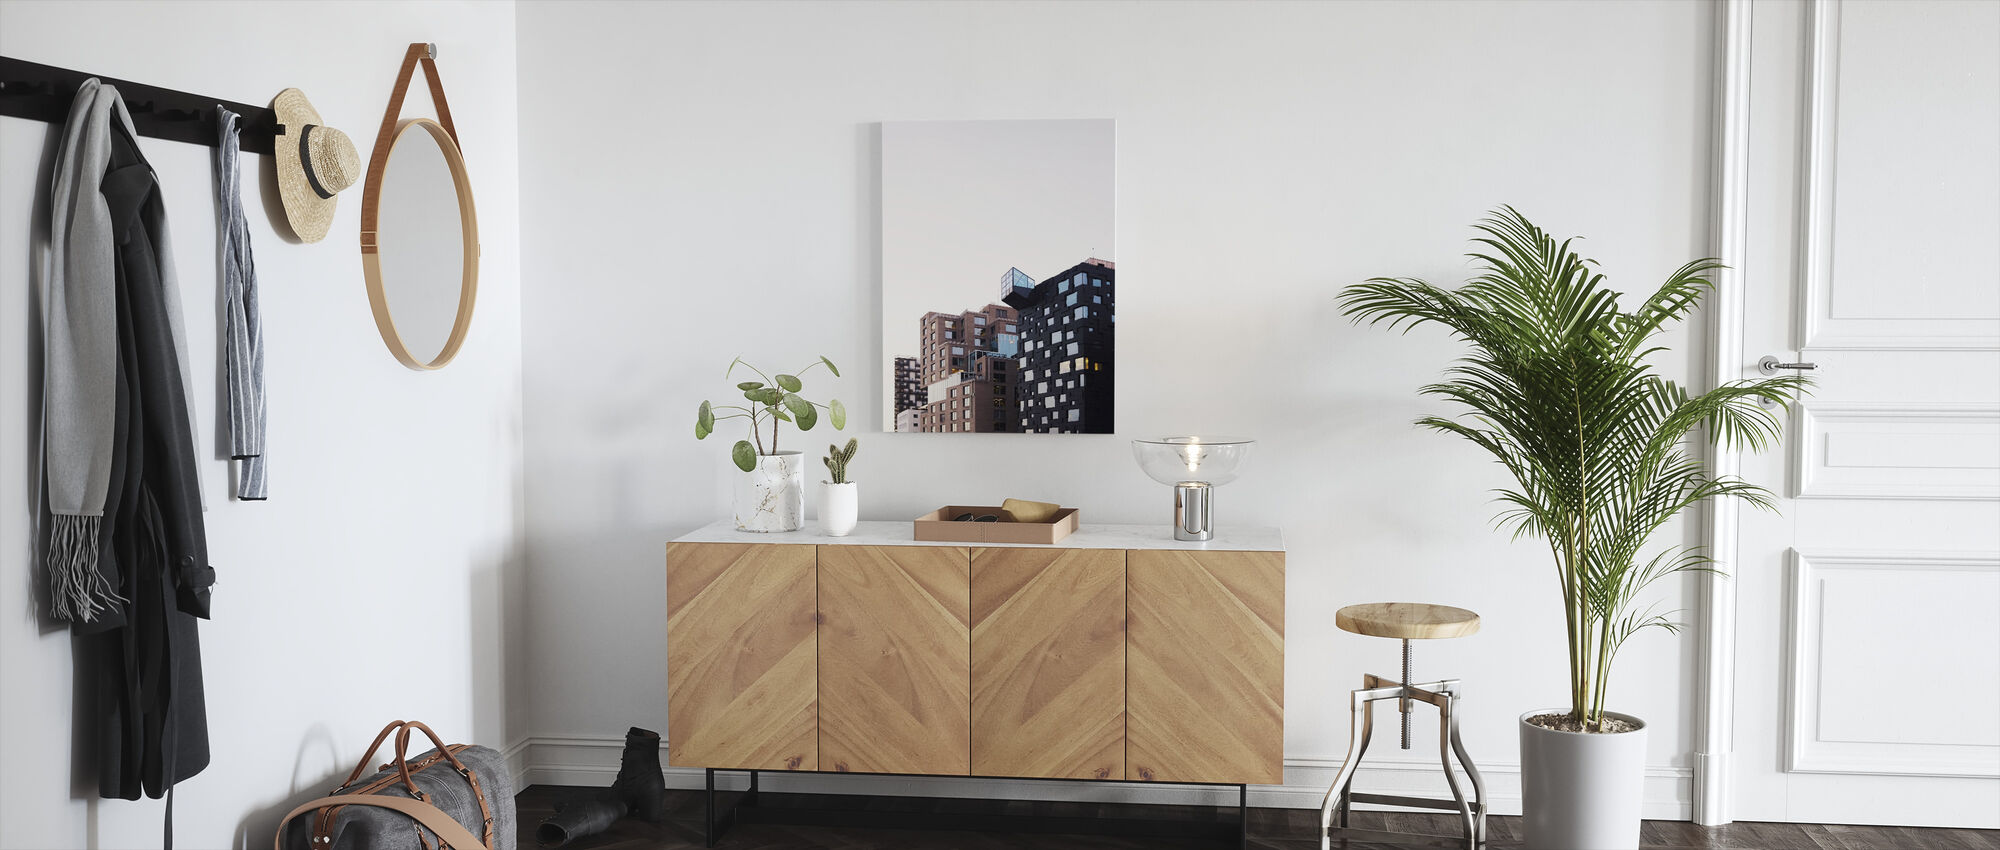 Apartment Blocks - Canvas print - Hallway